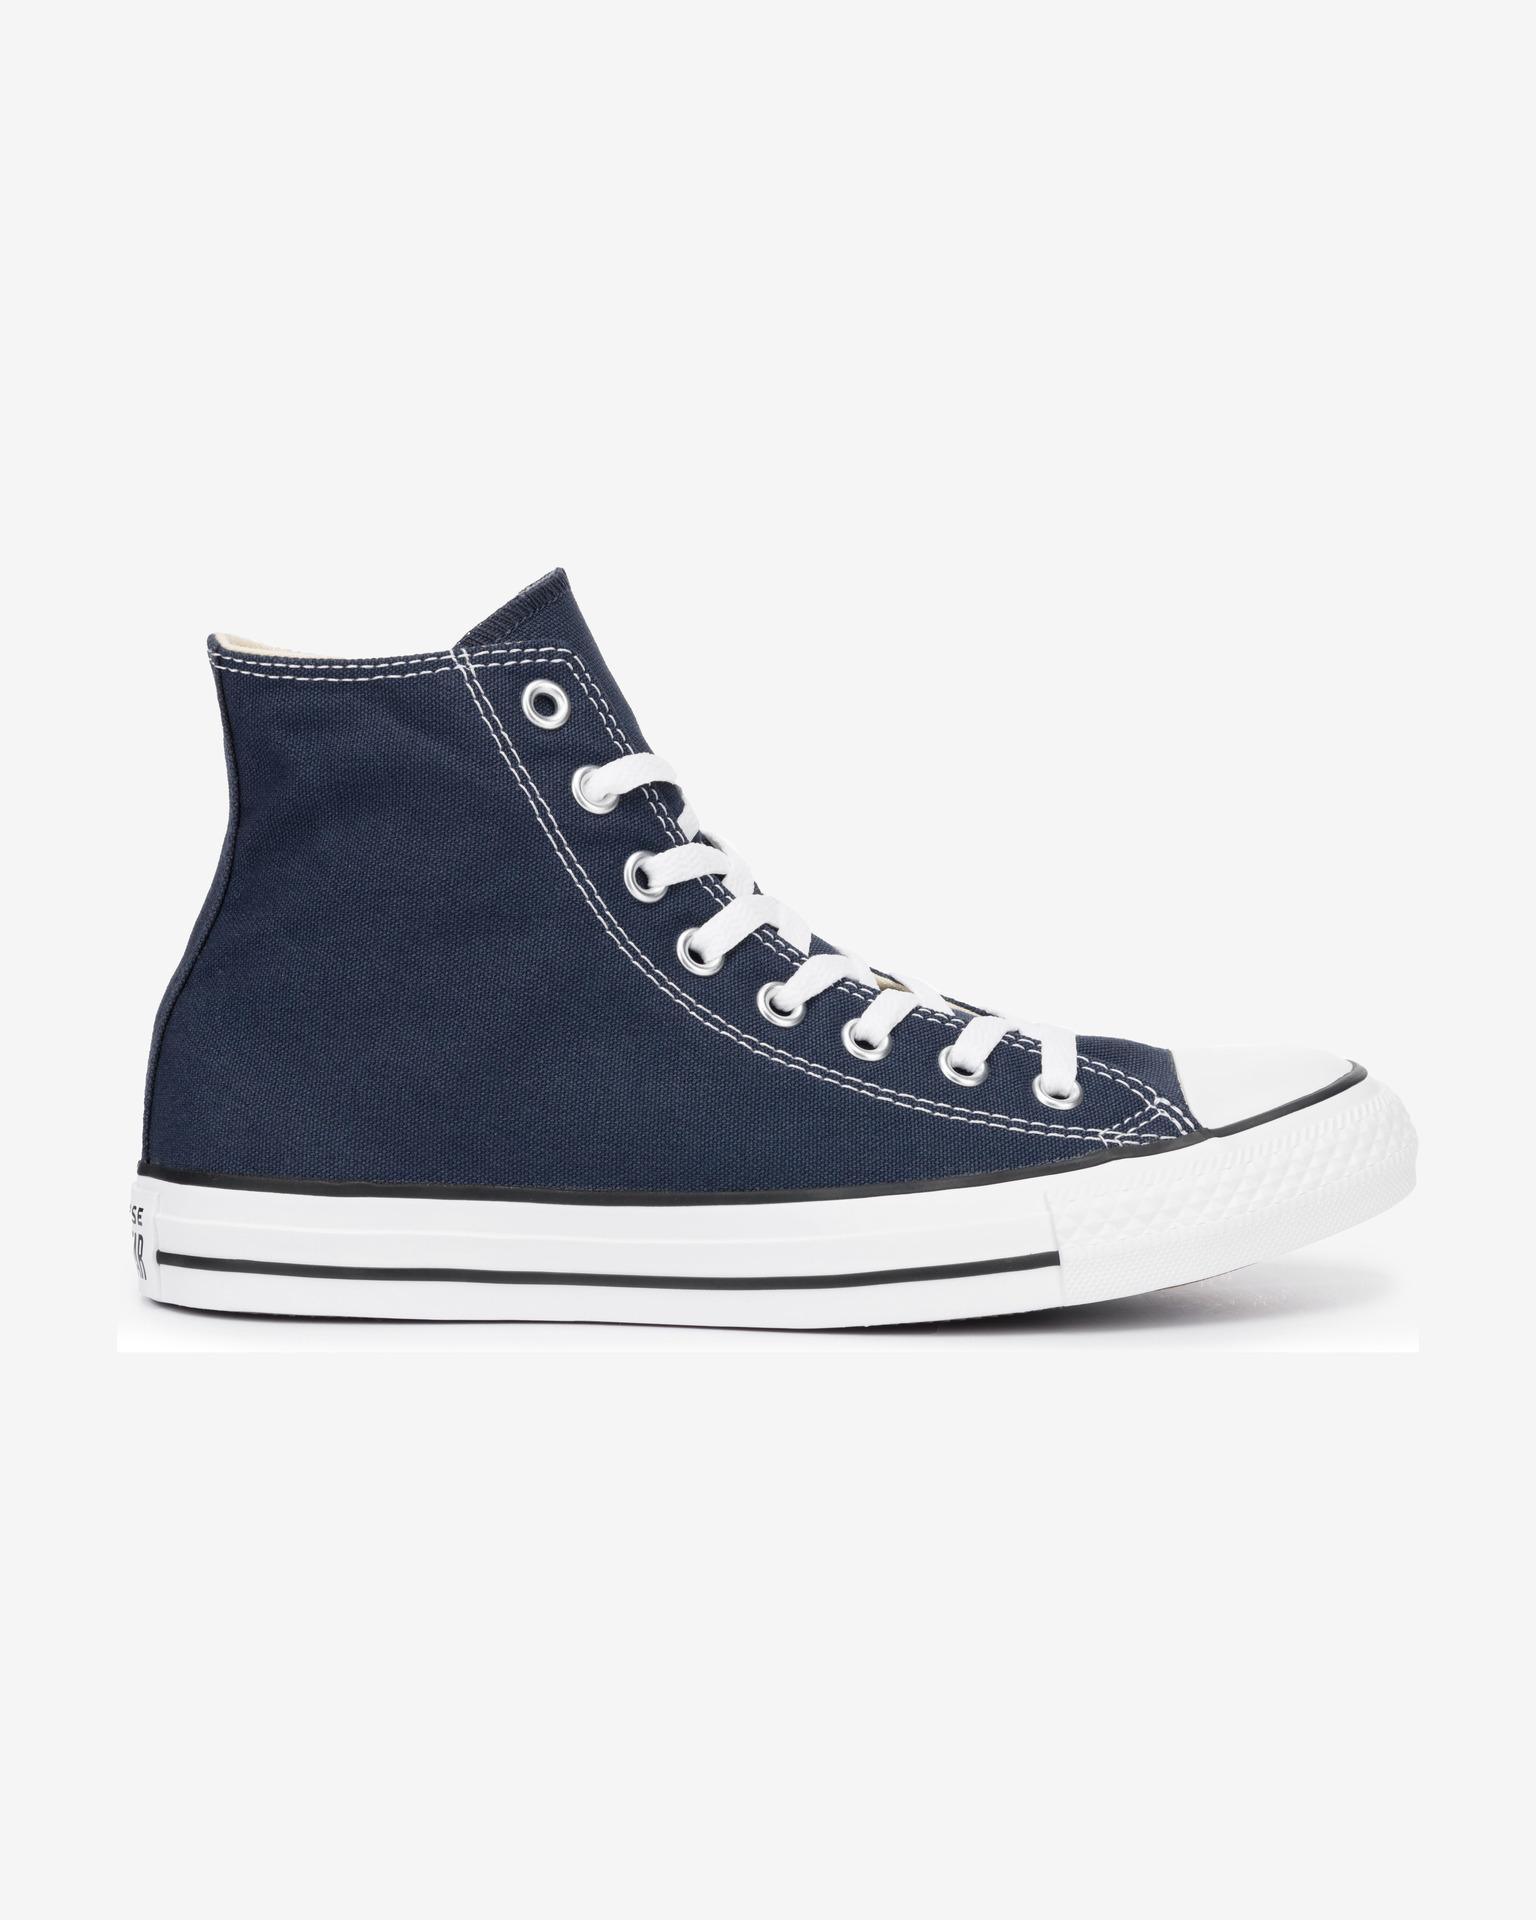 e2ffd1ea894 Converse modré pánské boty Chuck Taylor All Star Navy - Pánské Boty ...